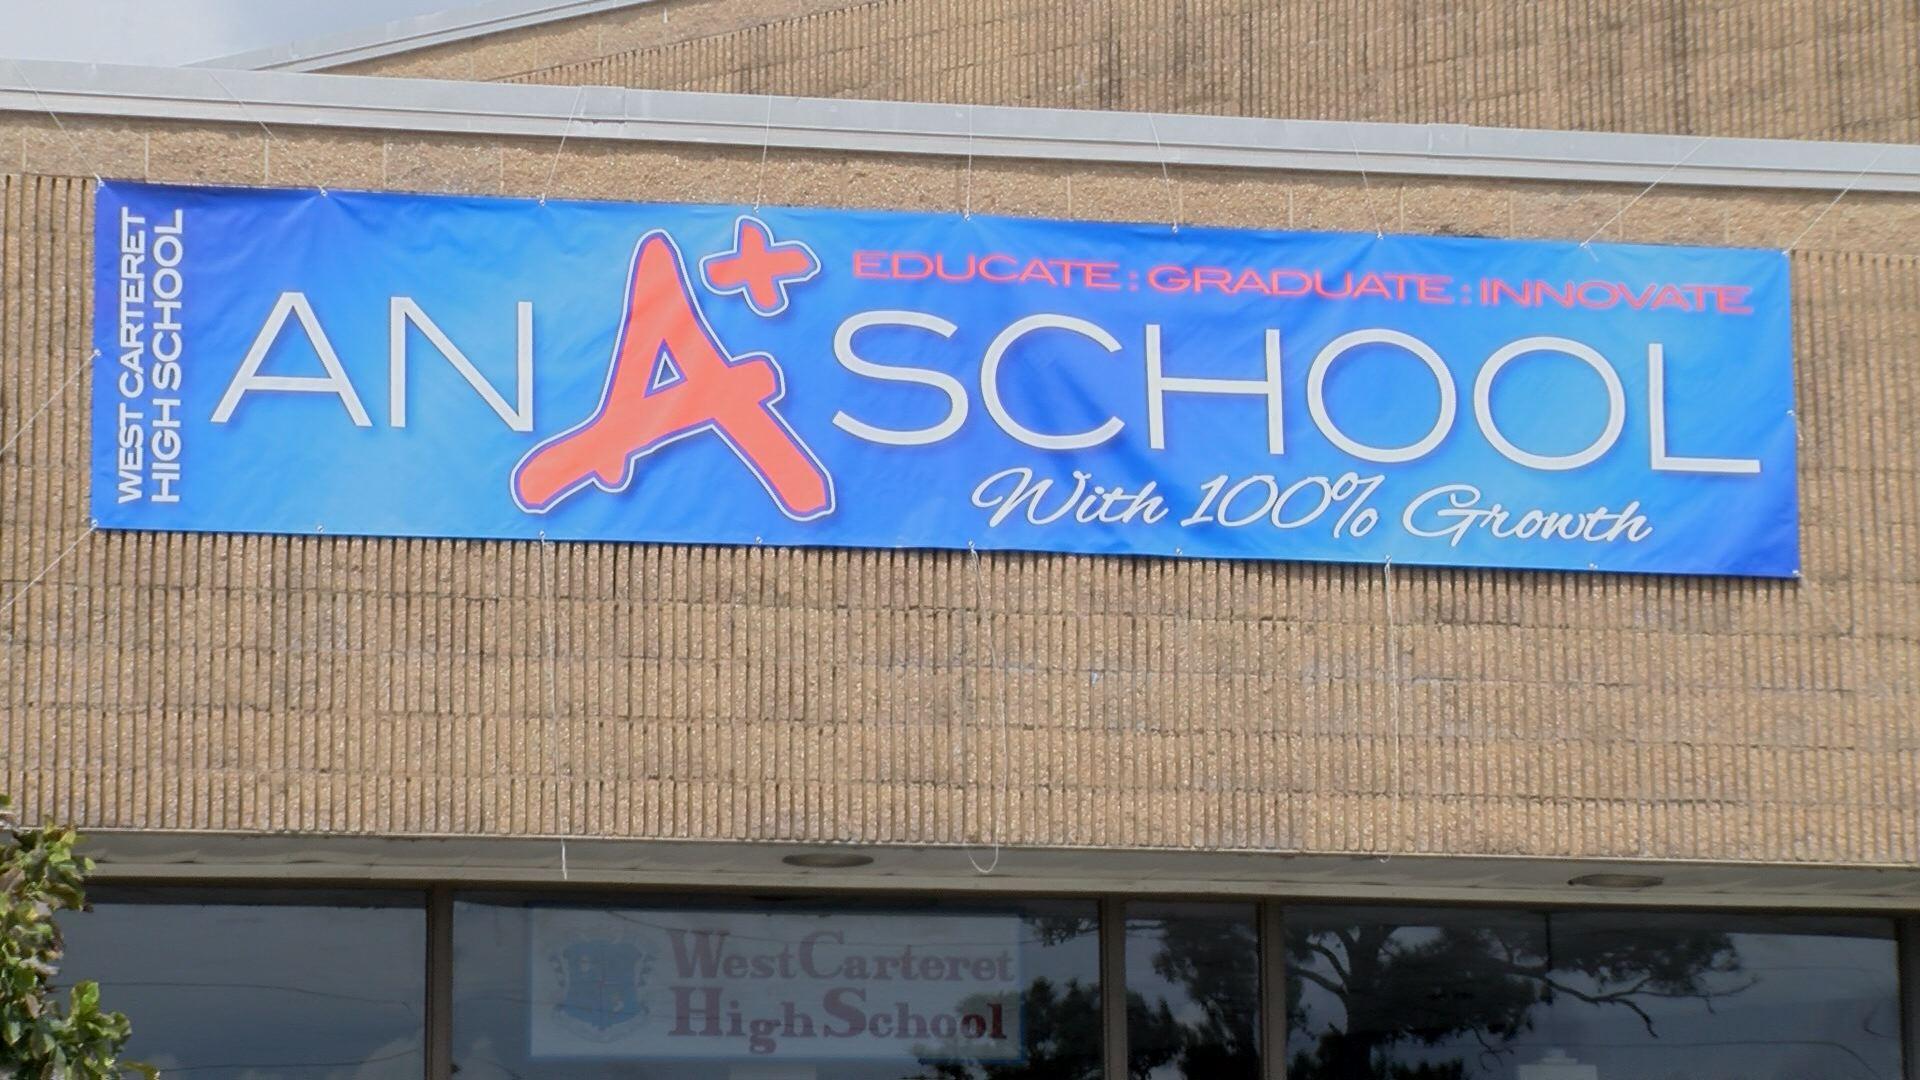 A+ SCHOOL_72914